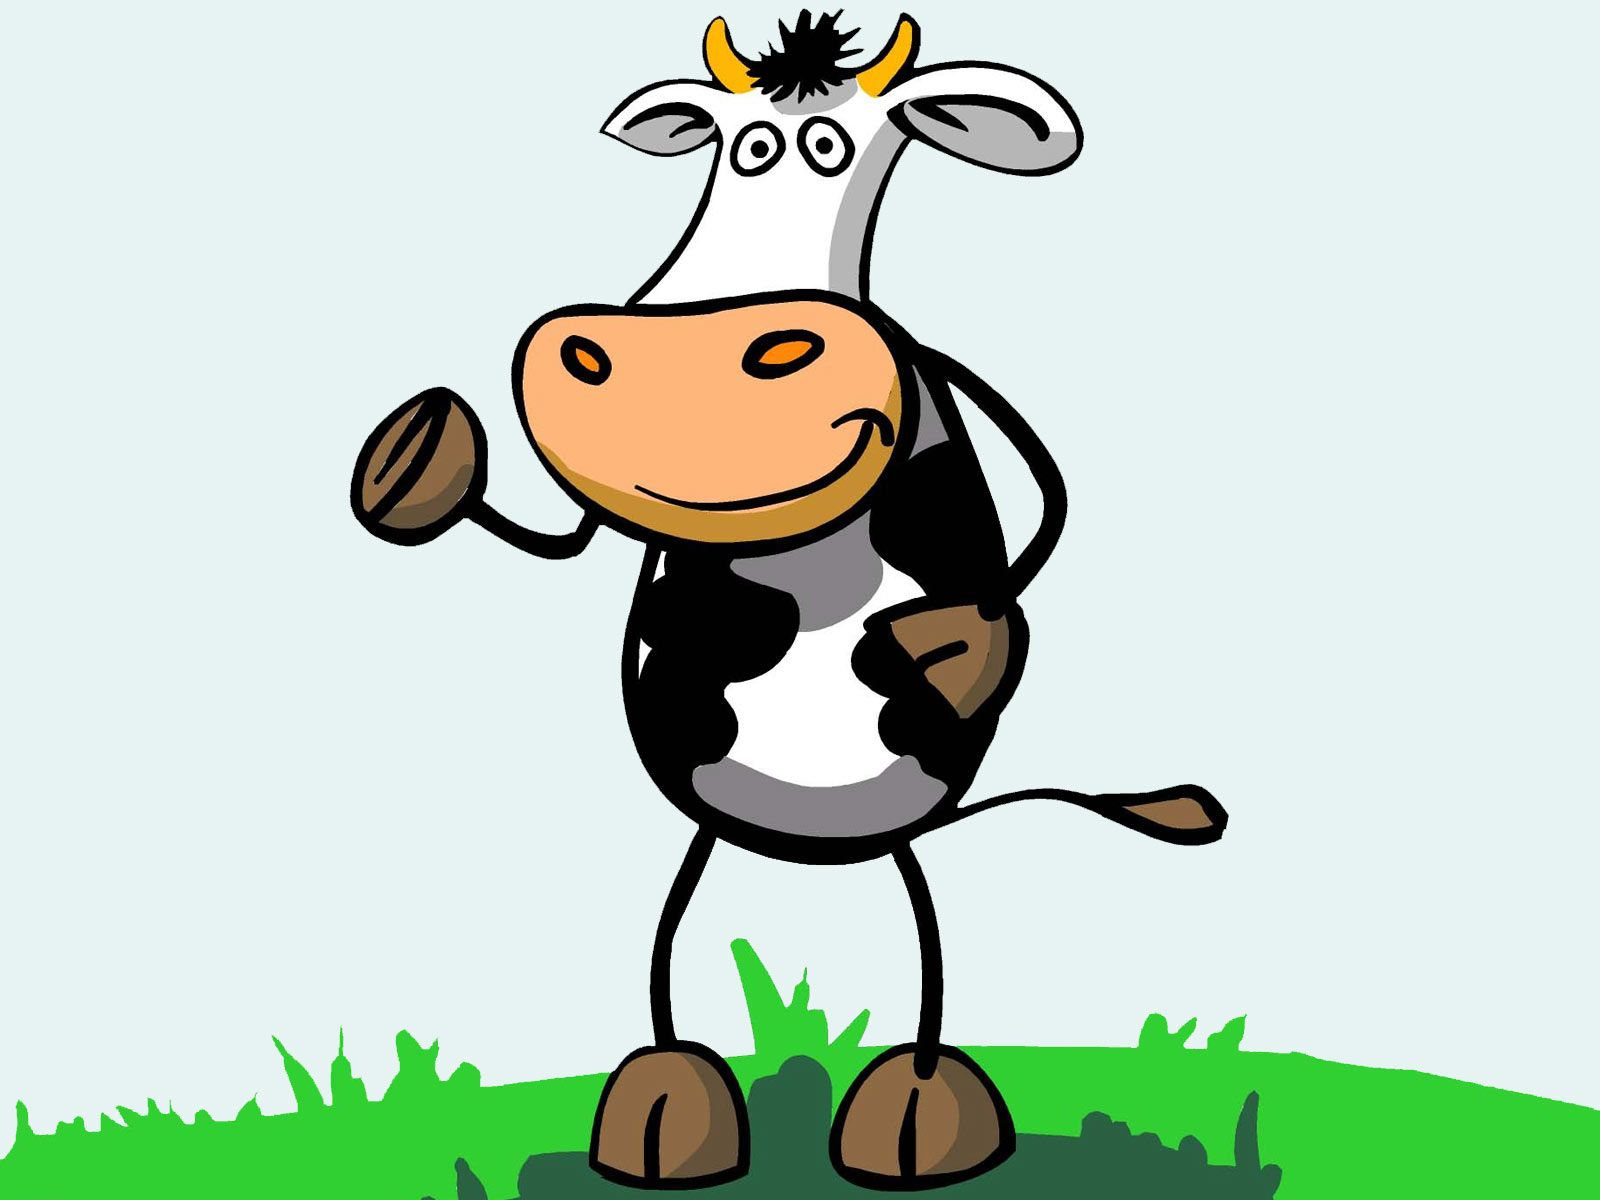 Cartoon Cow Picture Wallpaper Cartoon Cow Pictures Cow Pictures Cartoon Cow